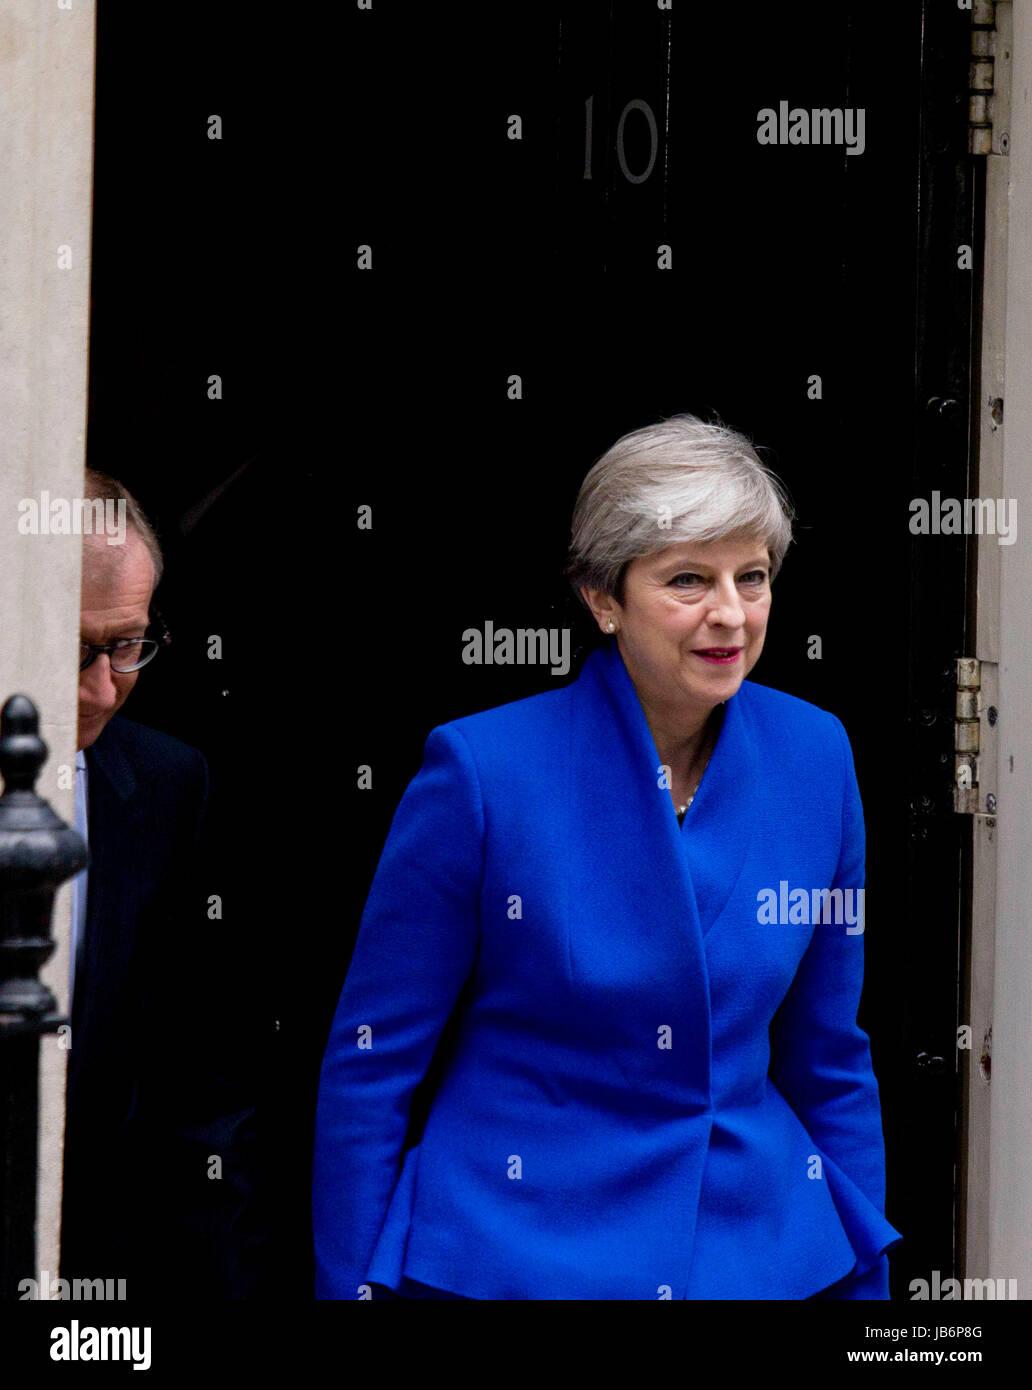 London, UK. 9th Jun, 2017. Theresa May post-election statement, No. 10 Downing Street, London, UK. 09th June, 2017. Stock Photo